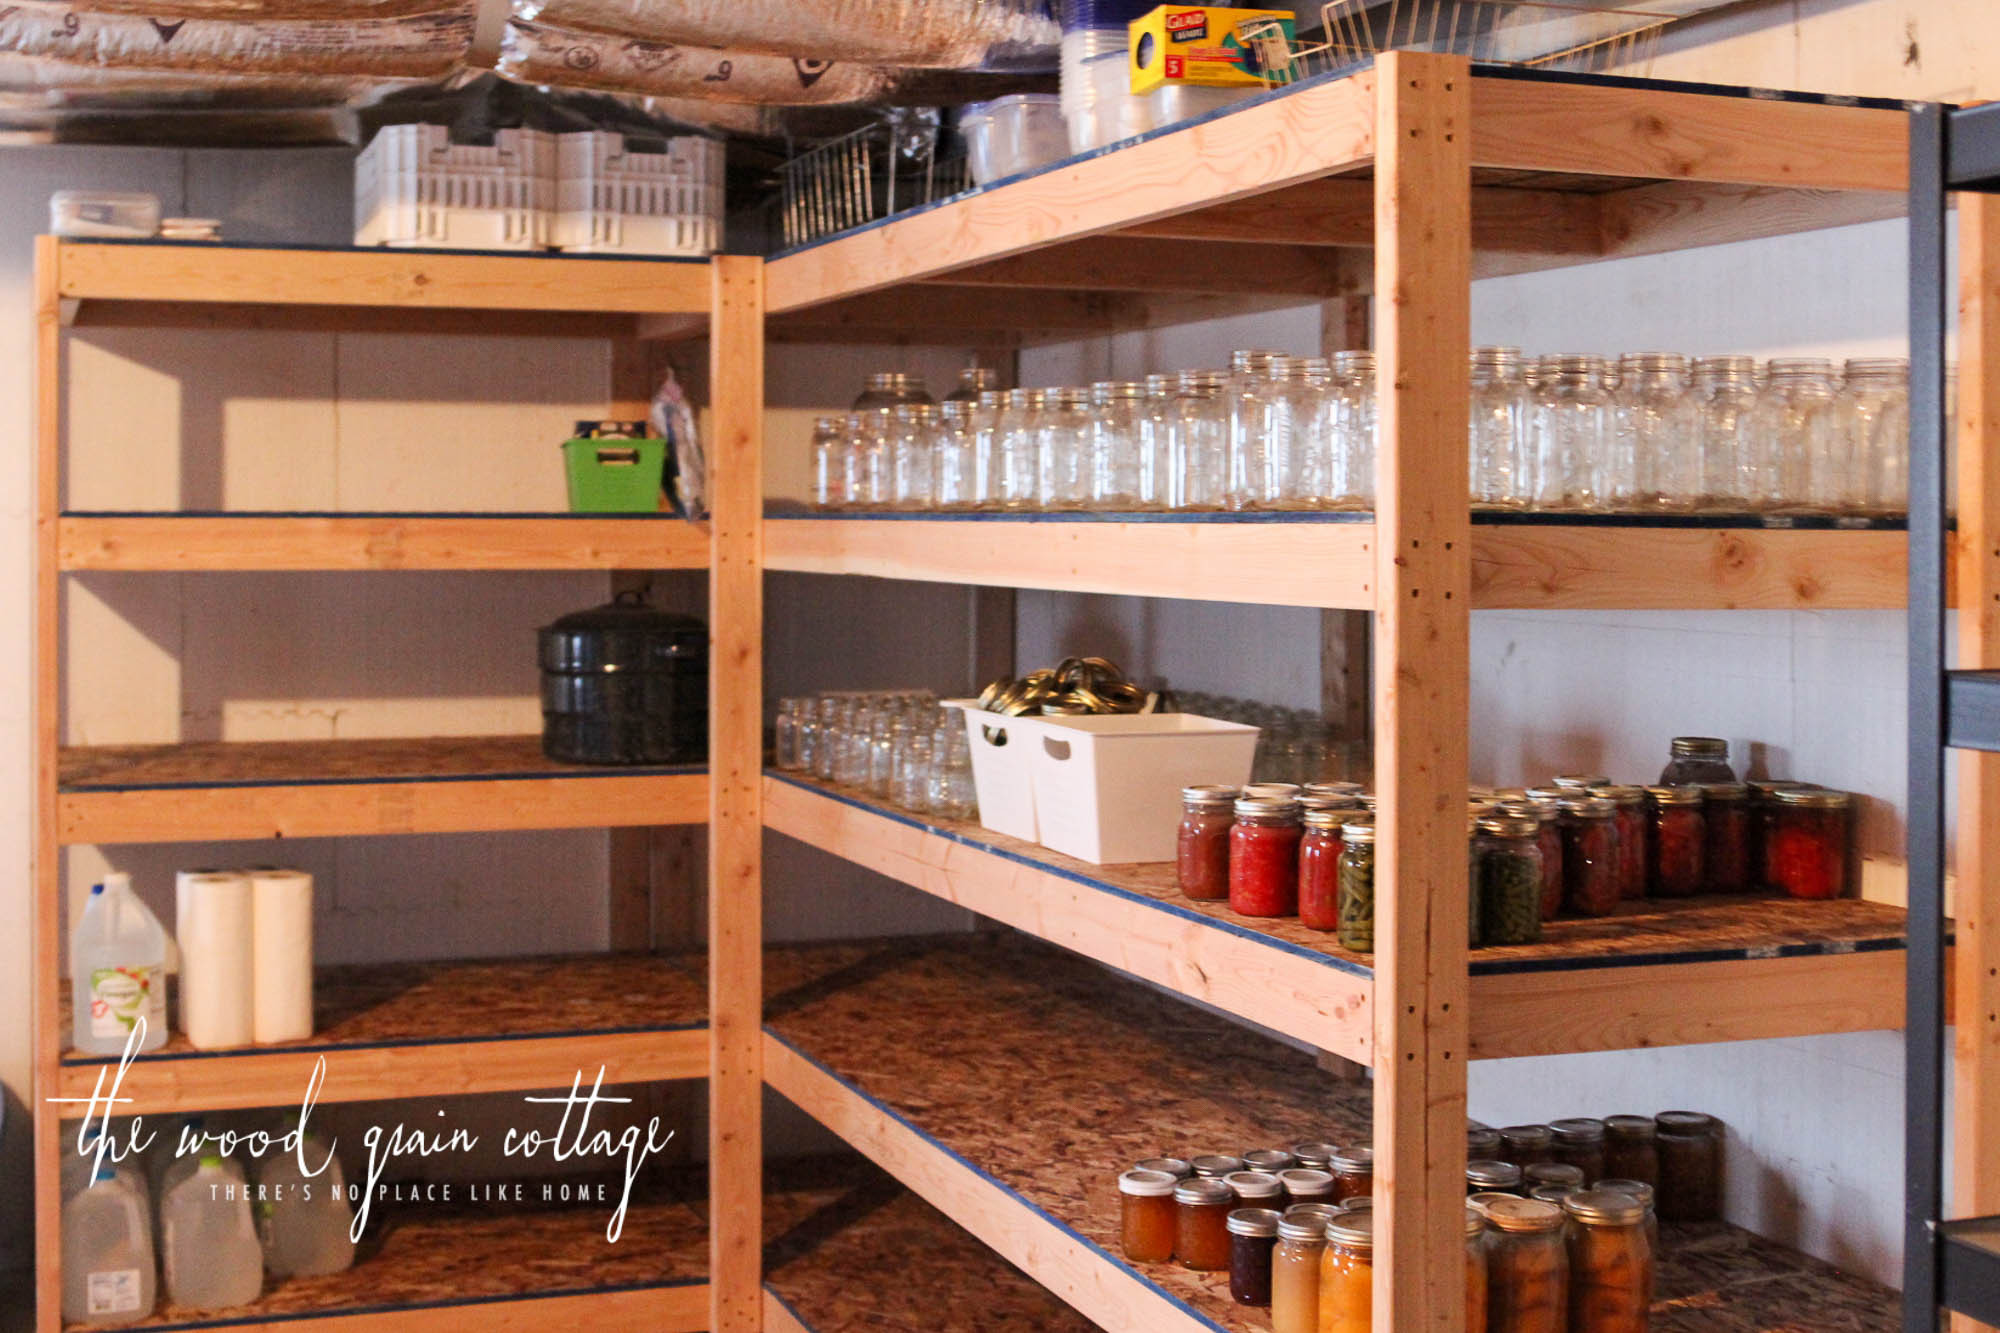 DIY Wood Storage Shelves  DIY Basement Shelving The Wood Grain Cottage